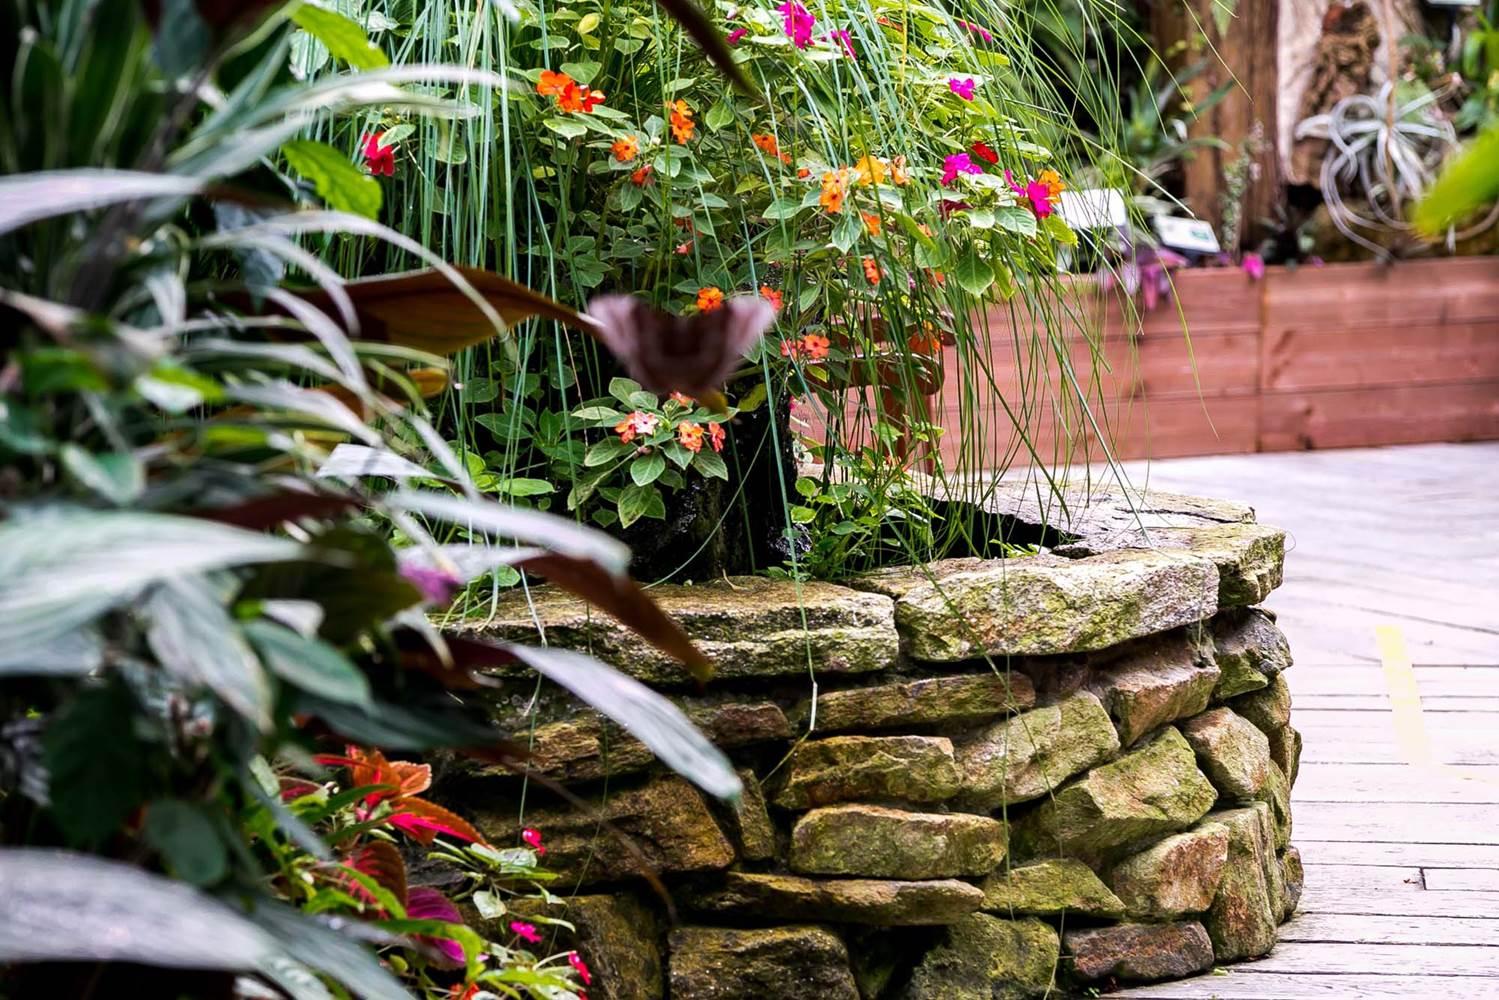 jardin-aux-papillons-morbihan-bretagne-sud-36 © Meero